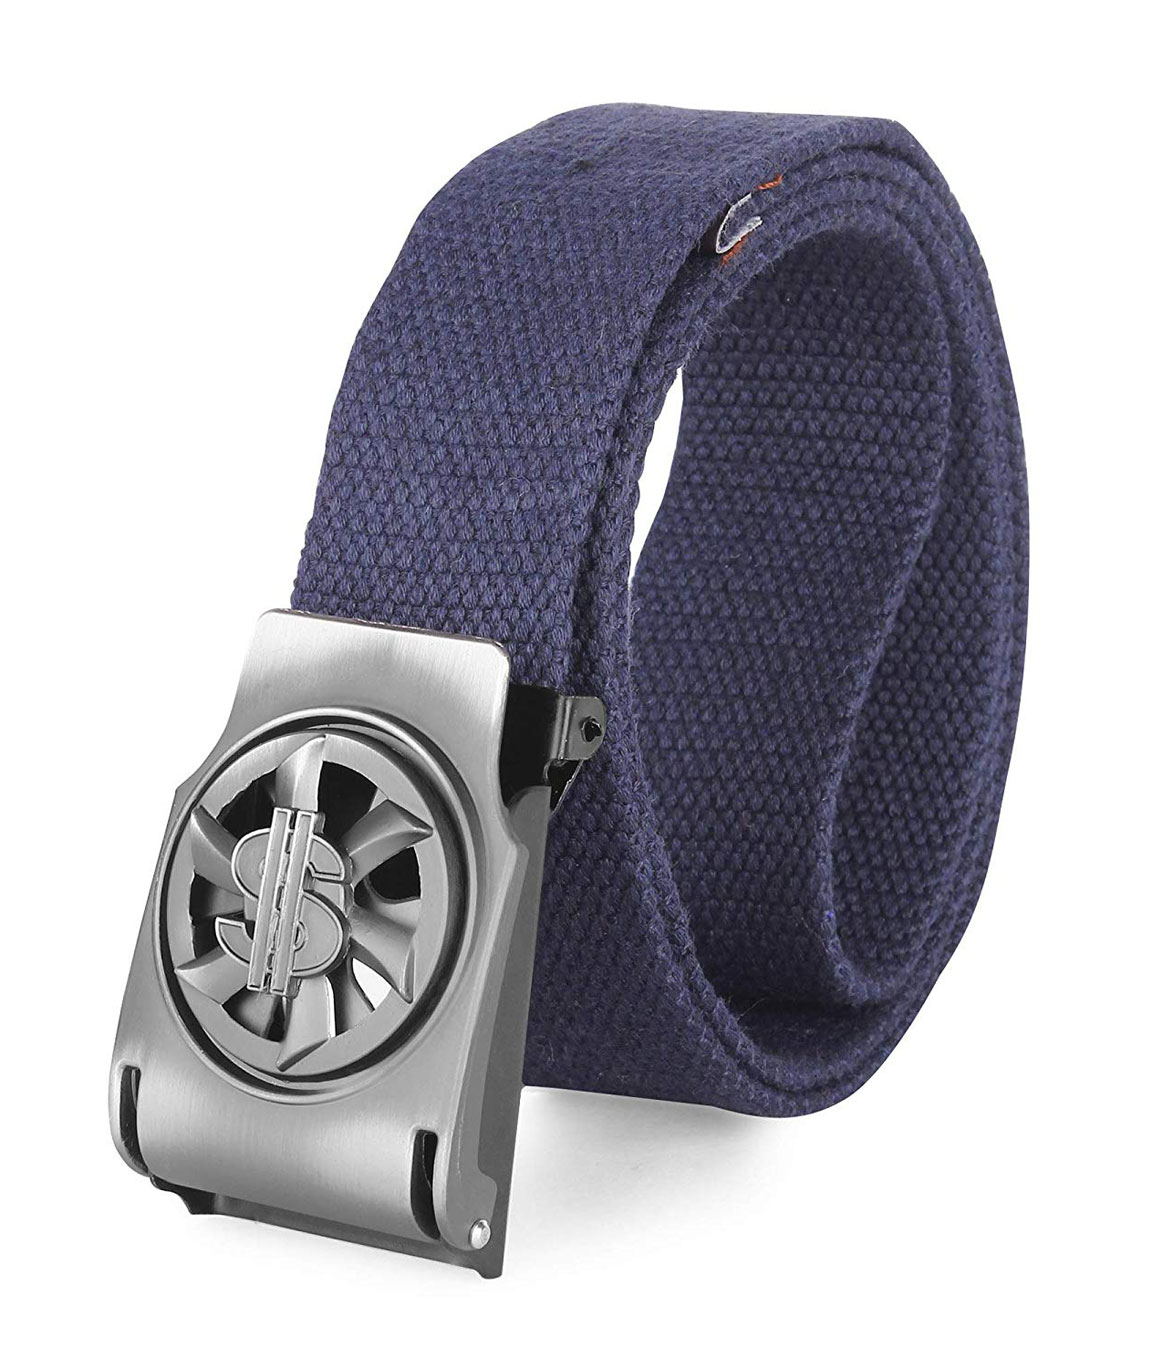 ZORO Men`s cottan Black Belt Guarantee) - belts for mens - belts for men casual stylish - belts for men formal branded